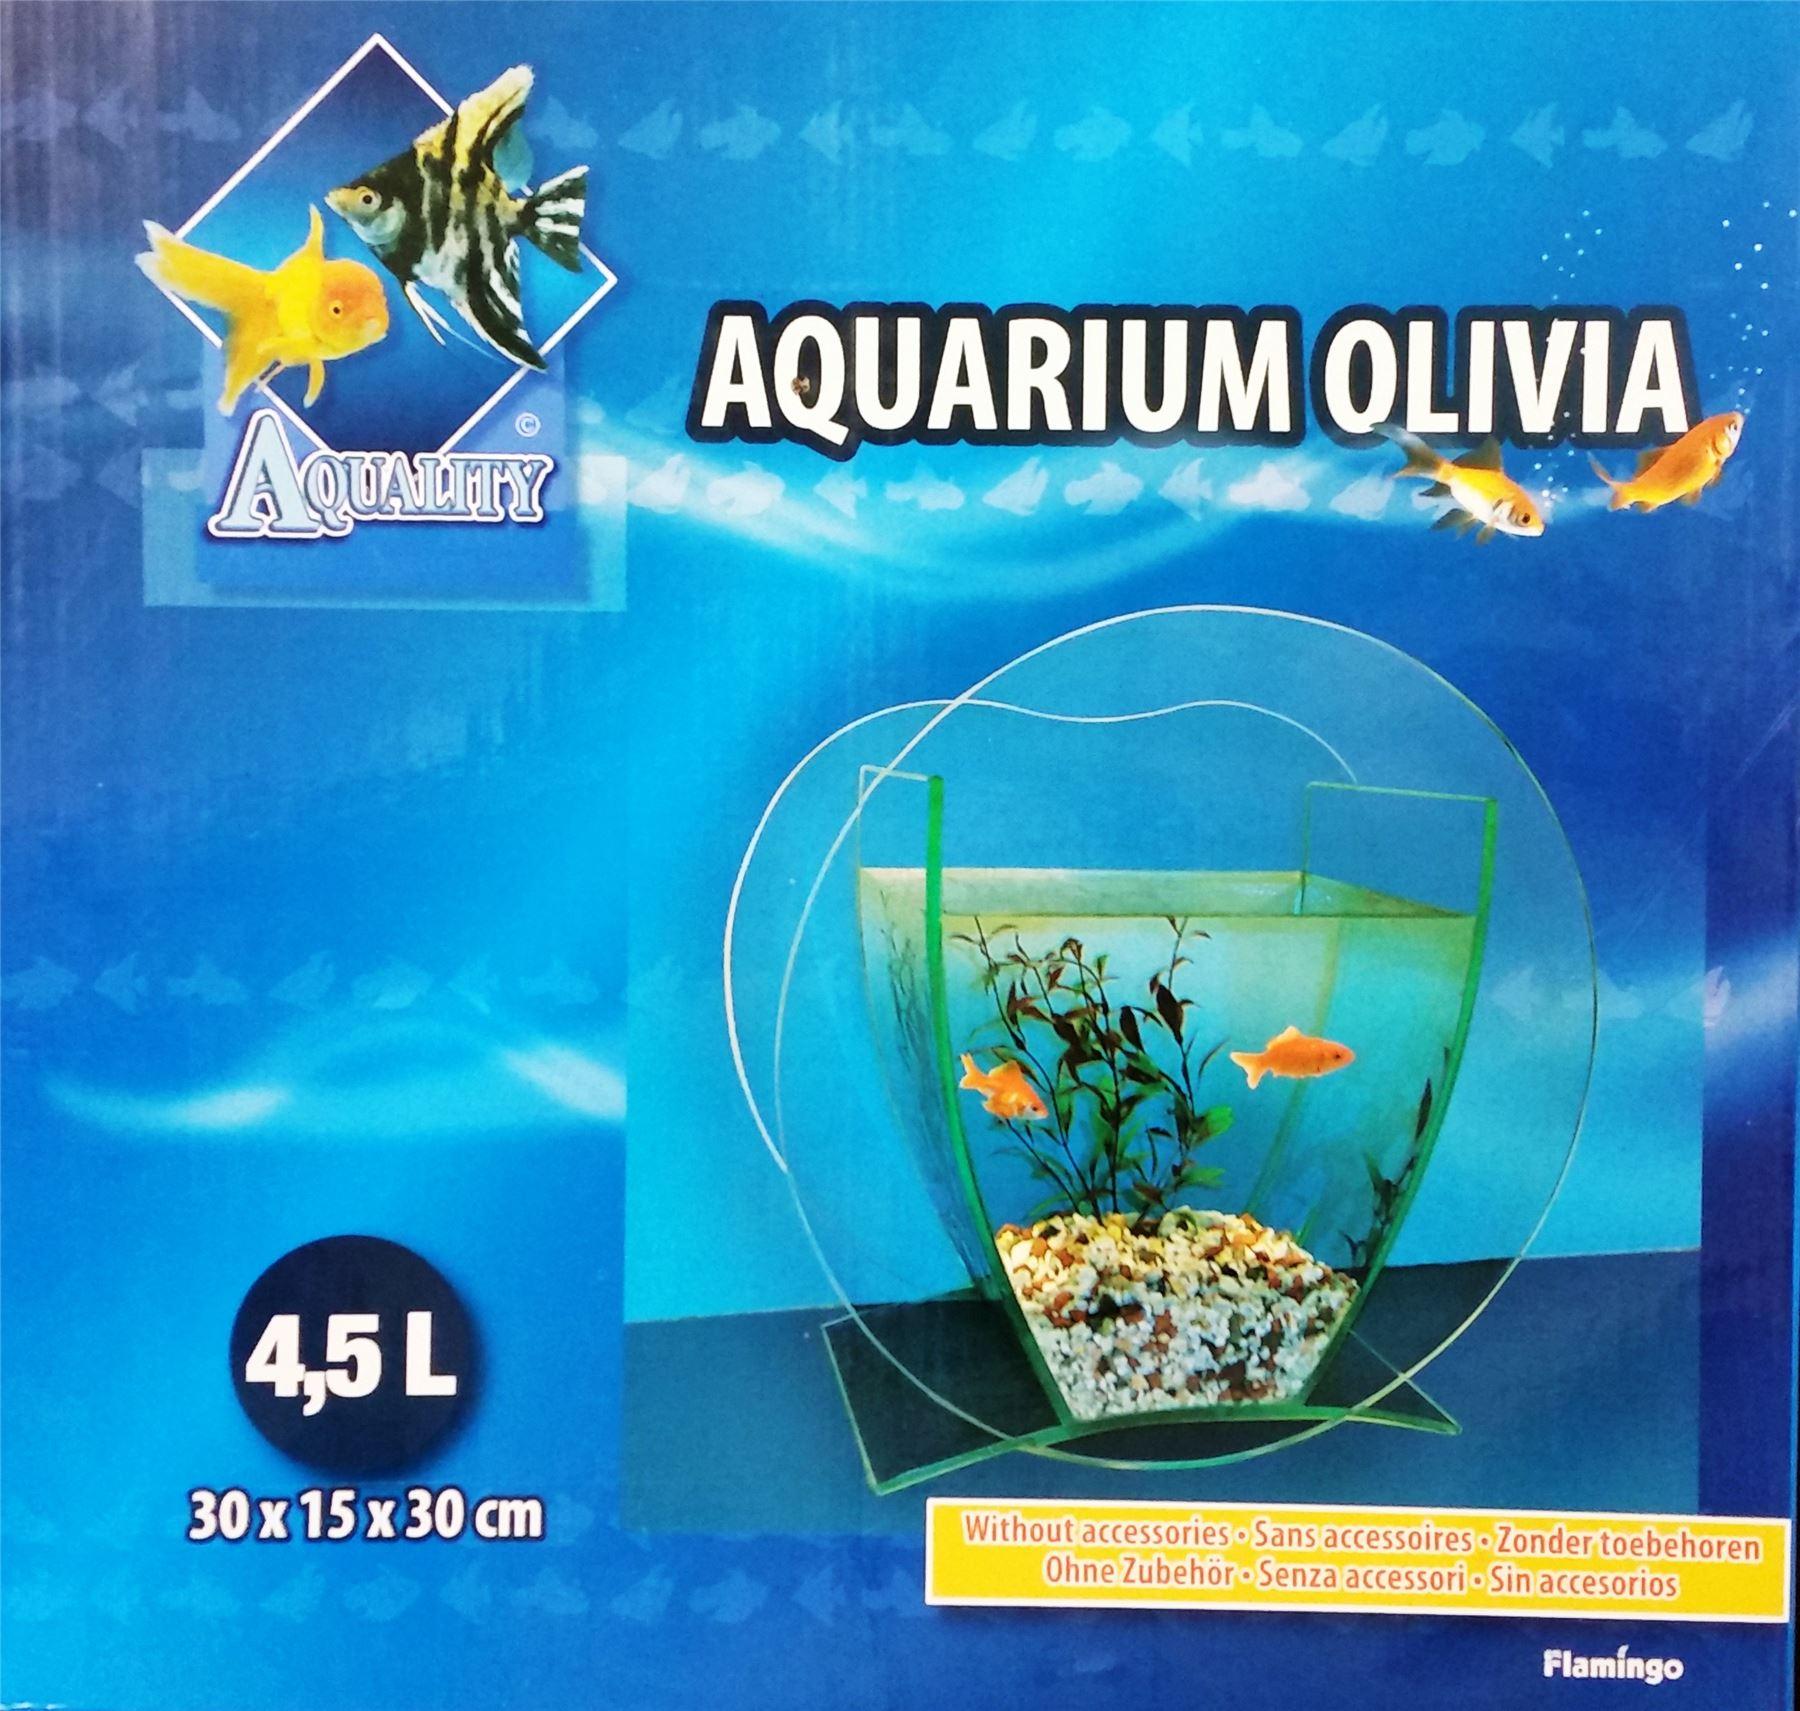 Cabinet aquarium fish tank tropical 60cm 2ft 100l - 4 5l Glass Aquarium Tank Fish Bowl Flamingo Olivia Stylish And Fashionable